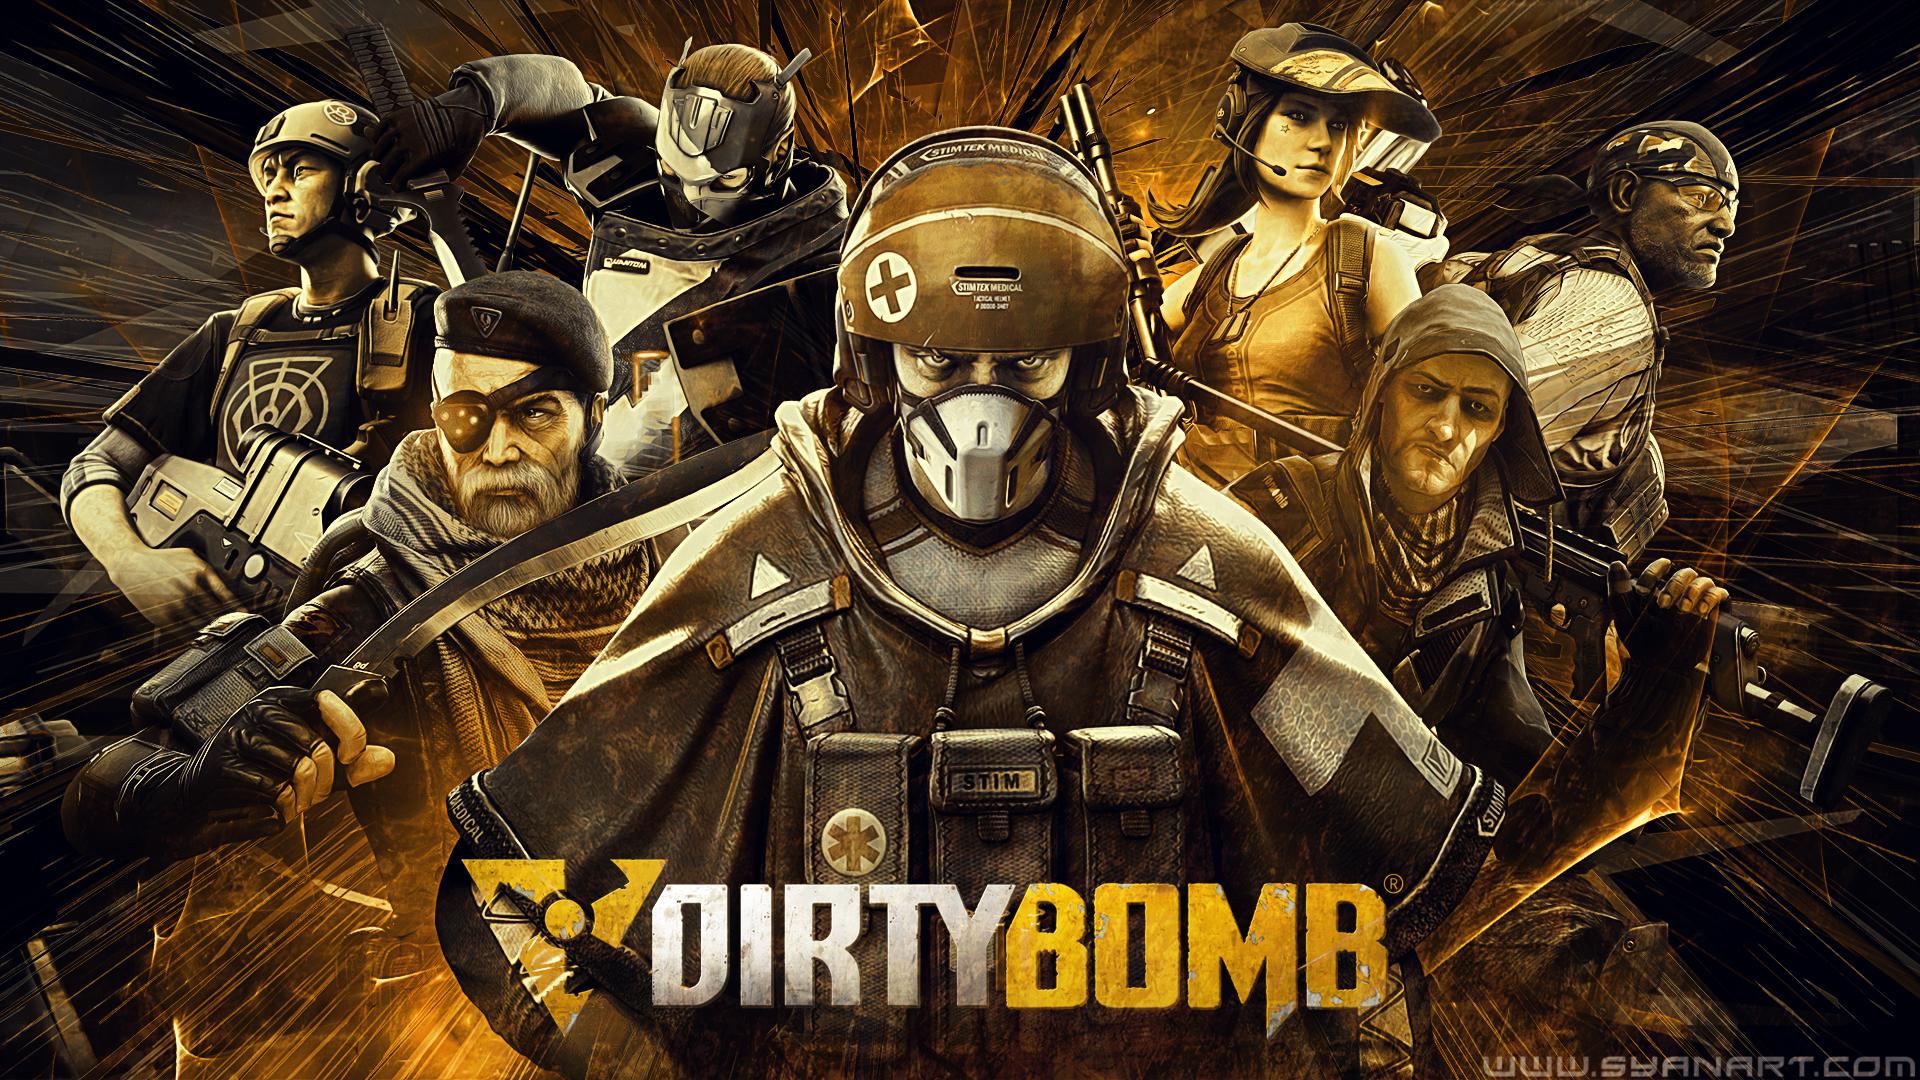 Dirty bomb Wallpaper – SyanArt « SyanArt